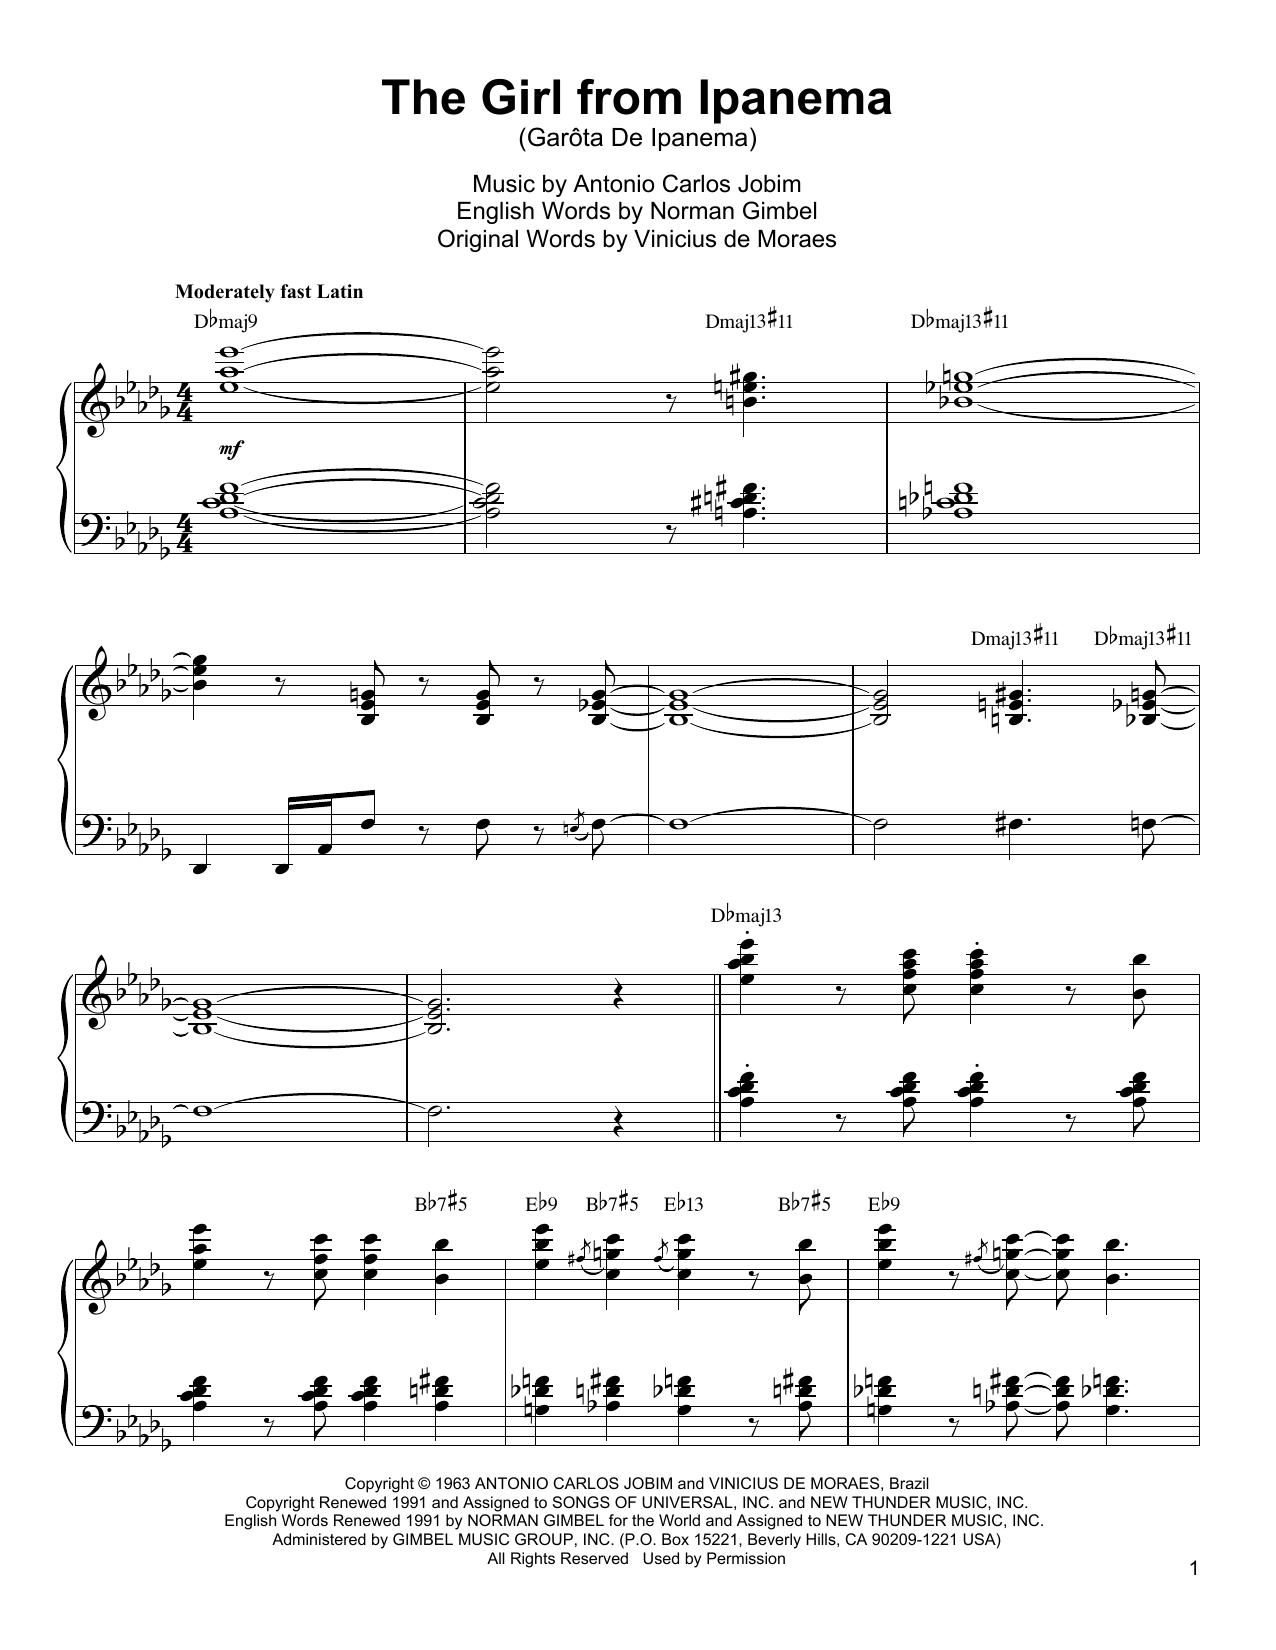 The Girl From Ipanema (Garota De Ipanema) Sheet Music